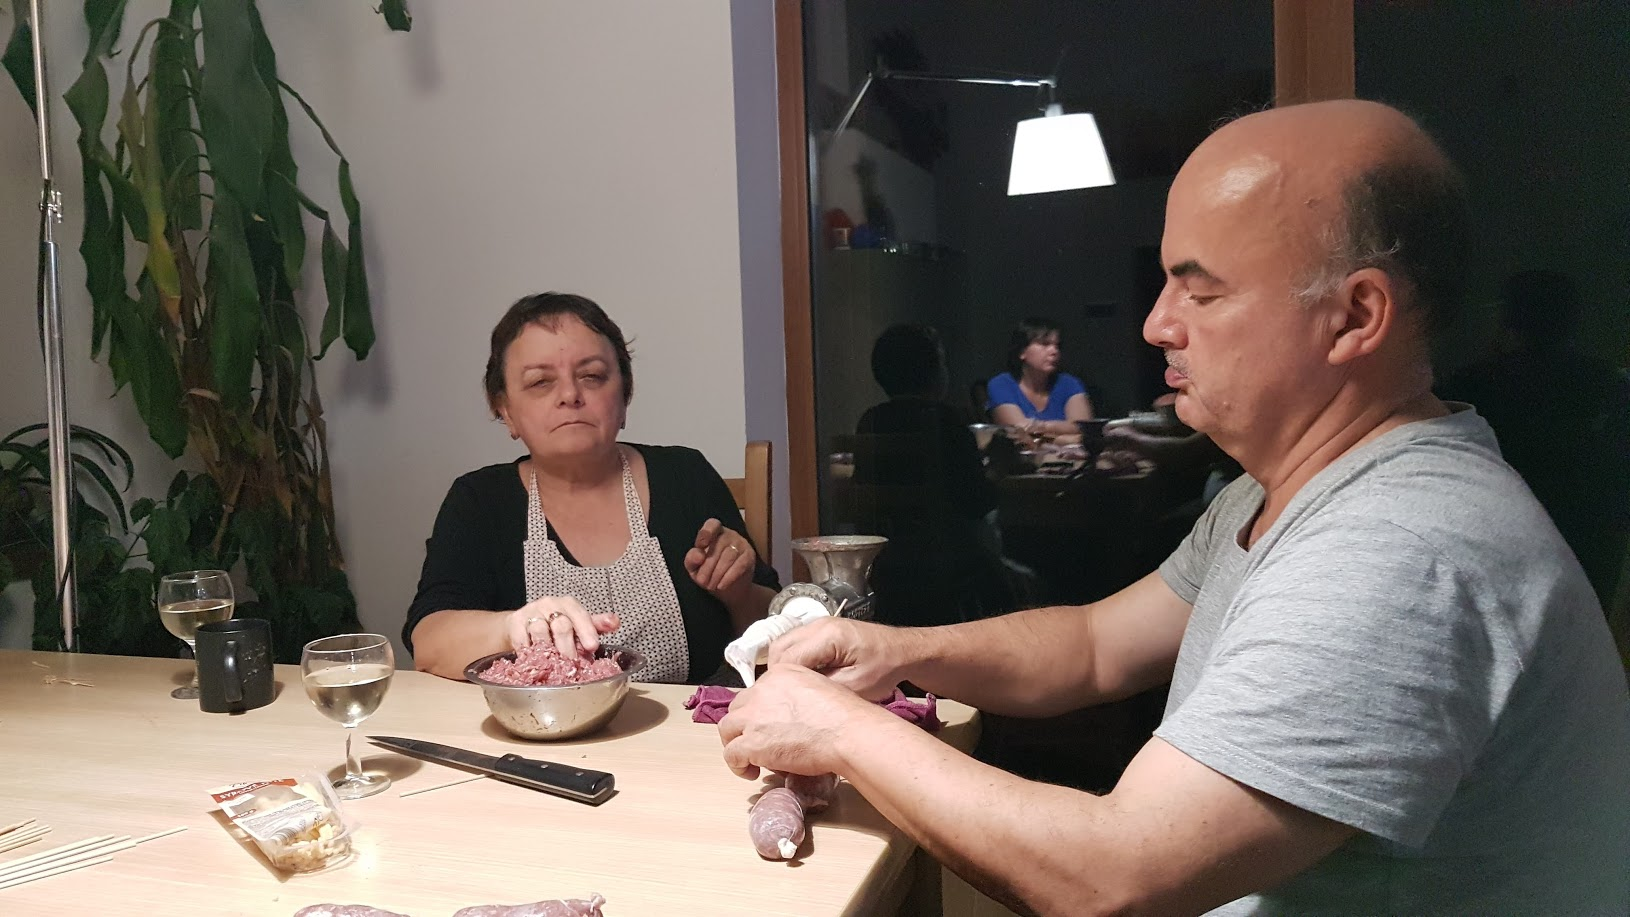 20191026_221929